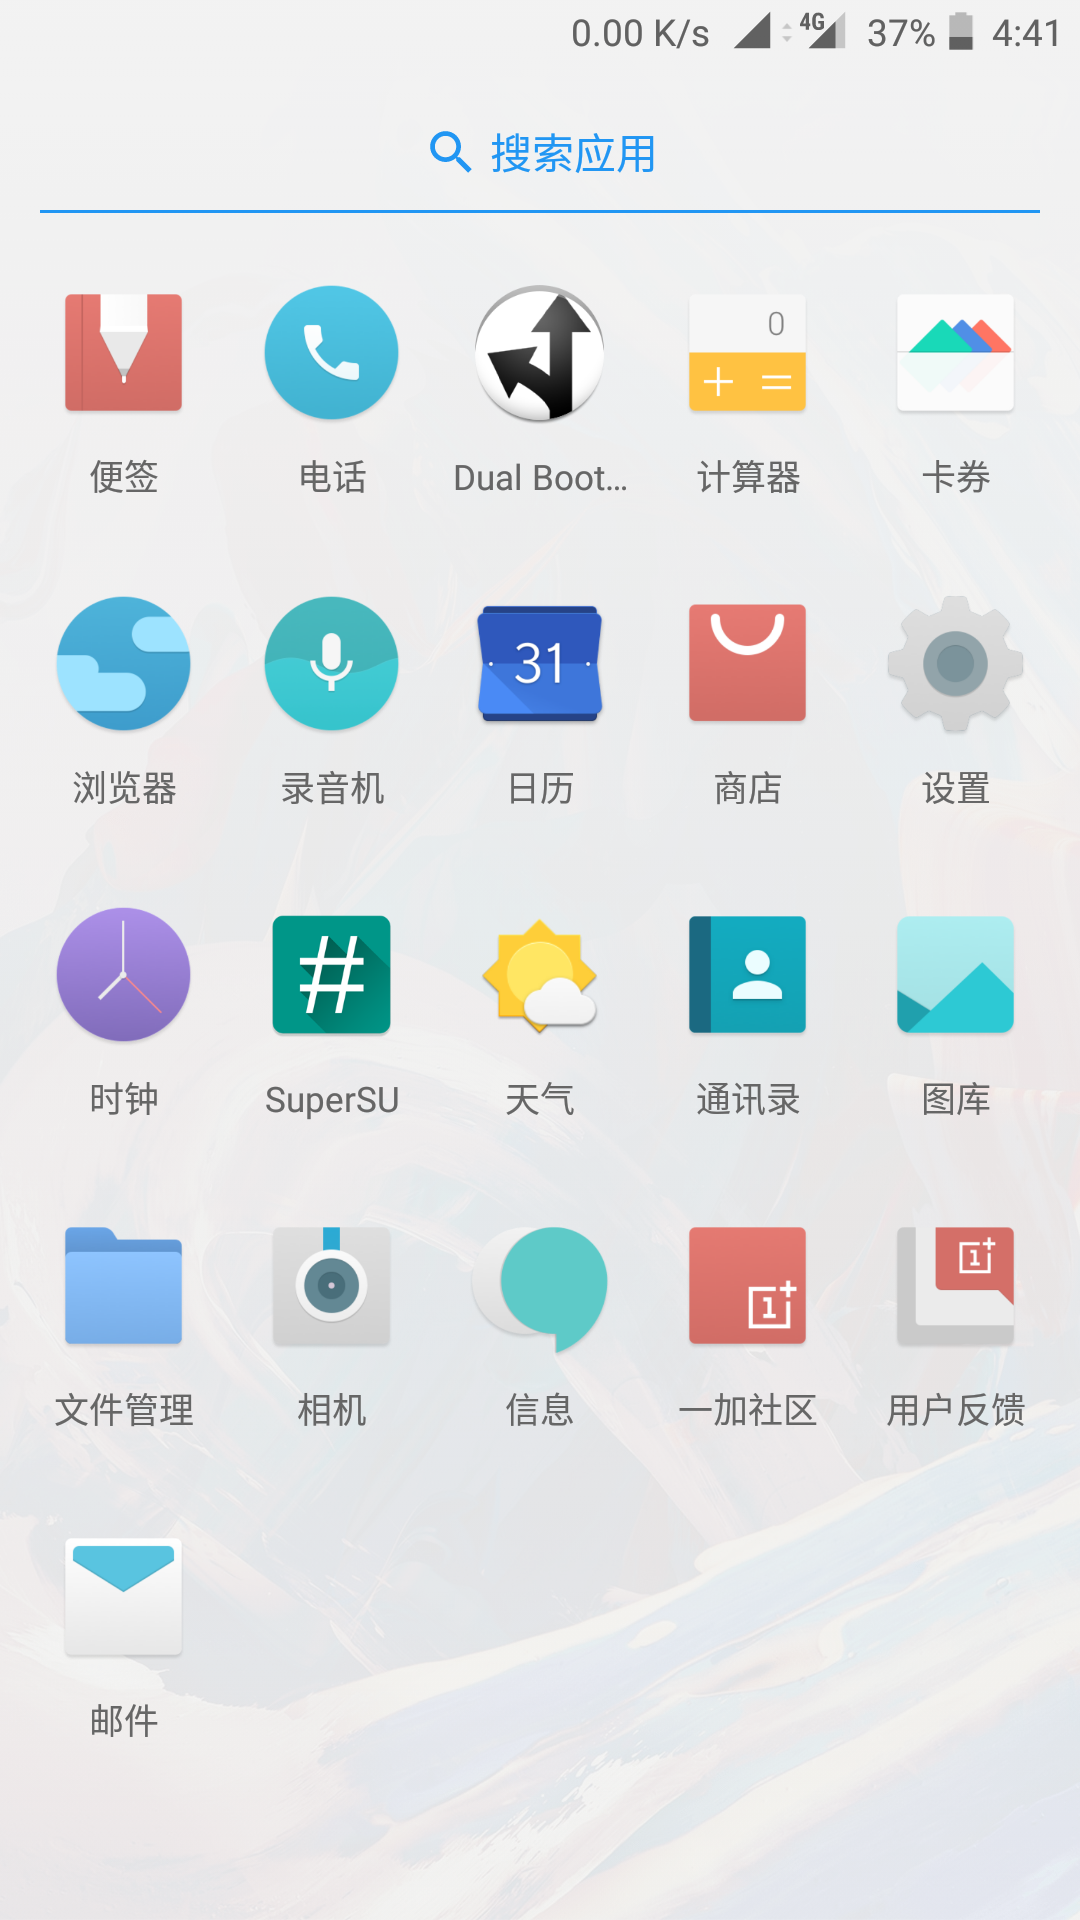 Screenshot_20170604-164144.png